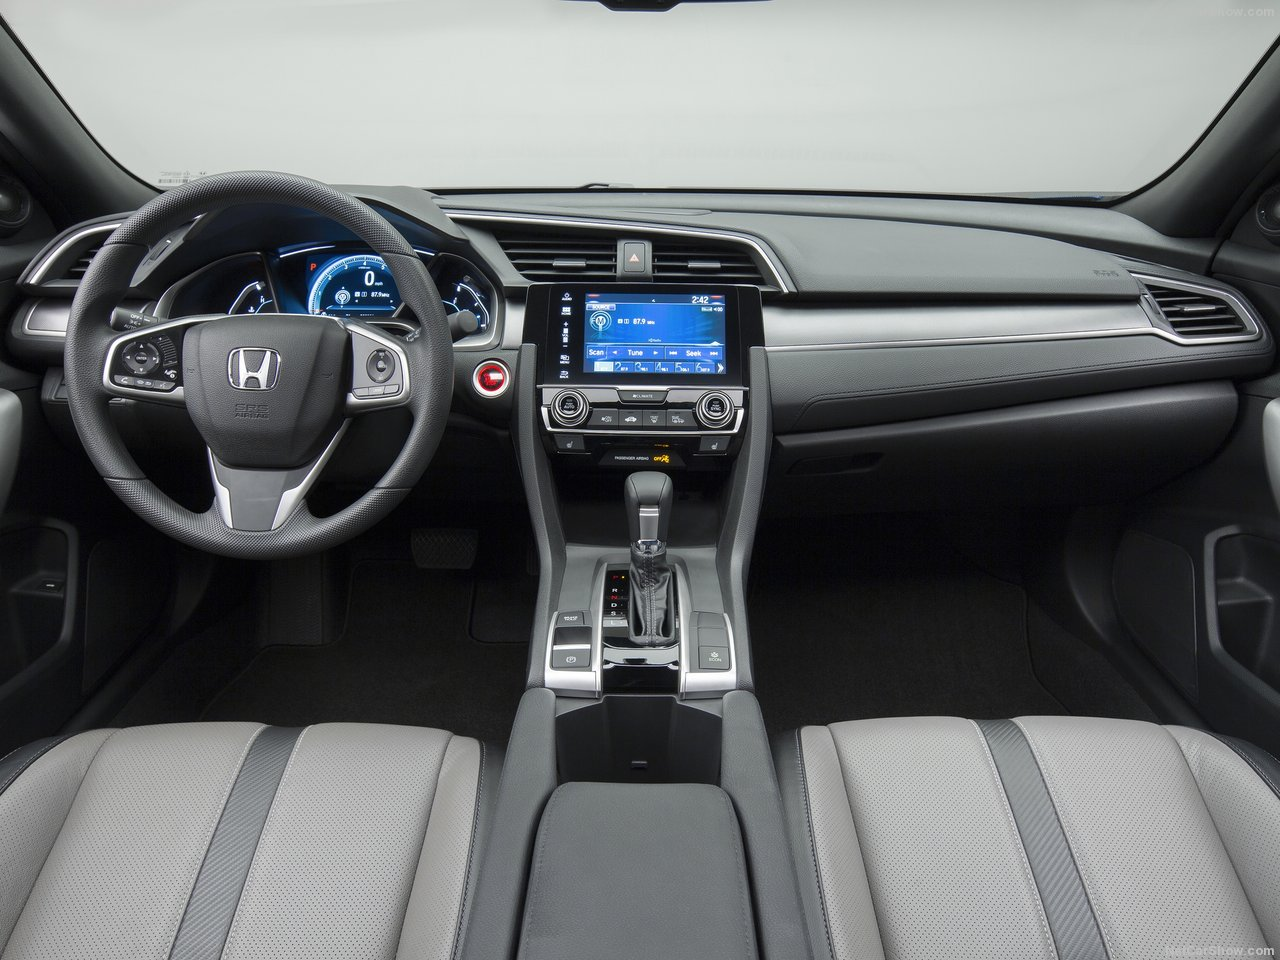 Honda-Civic_Coupe_2016_1280x960_wallpaper_08